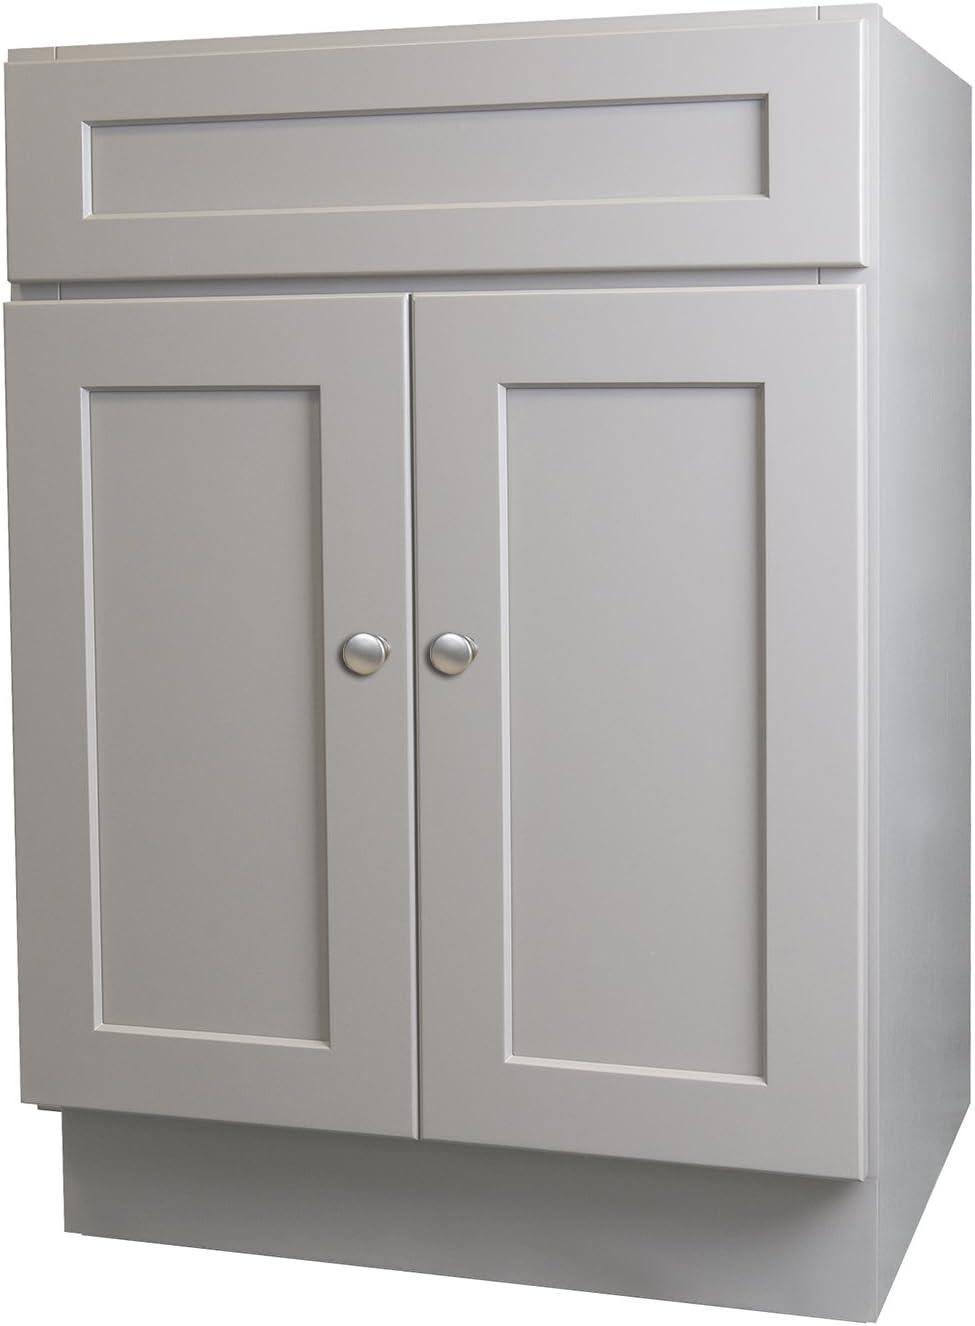 Shaker Gray 24 X 21 Bathroom Vanity Cabinet Amazon Com